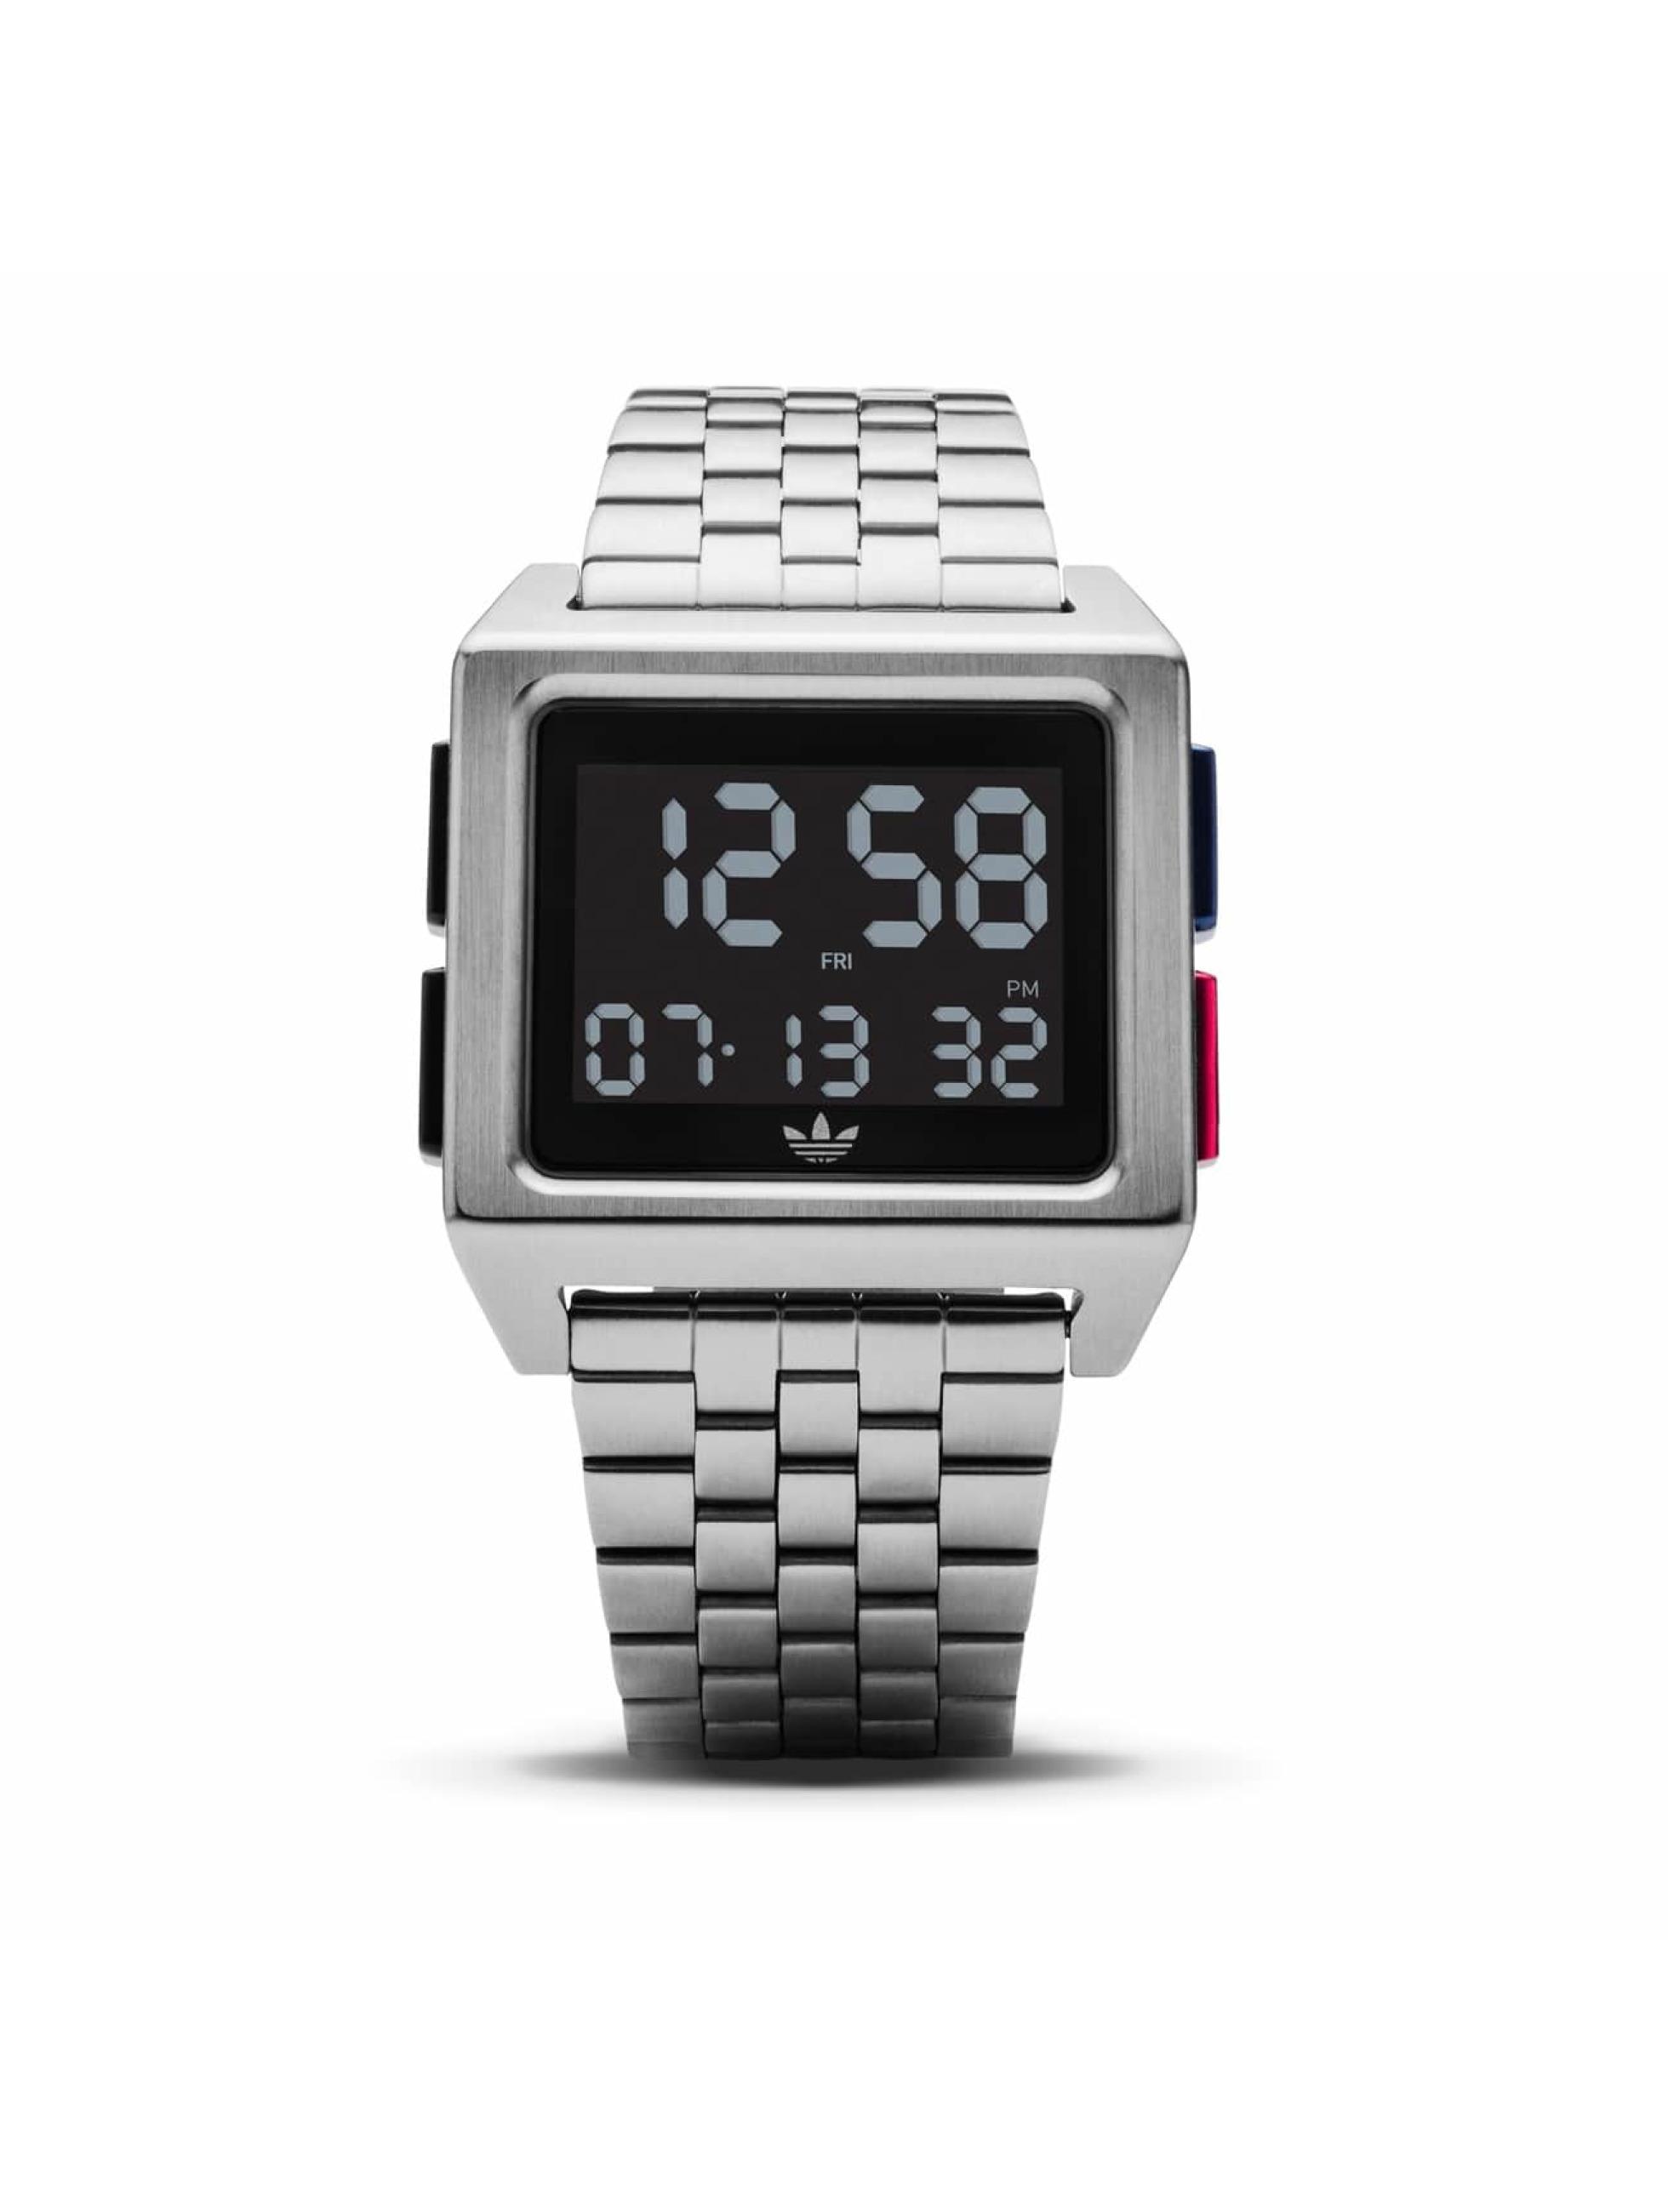 Adidas Watches Montre Archive M1 argent